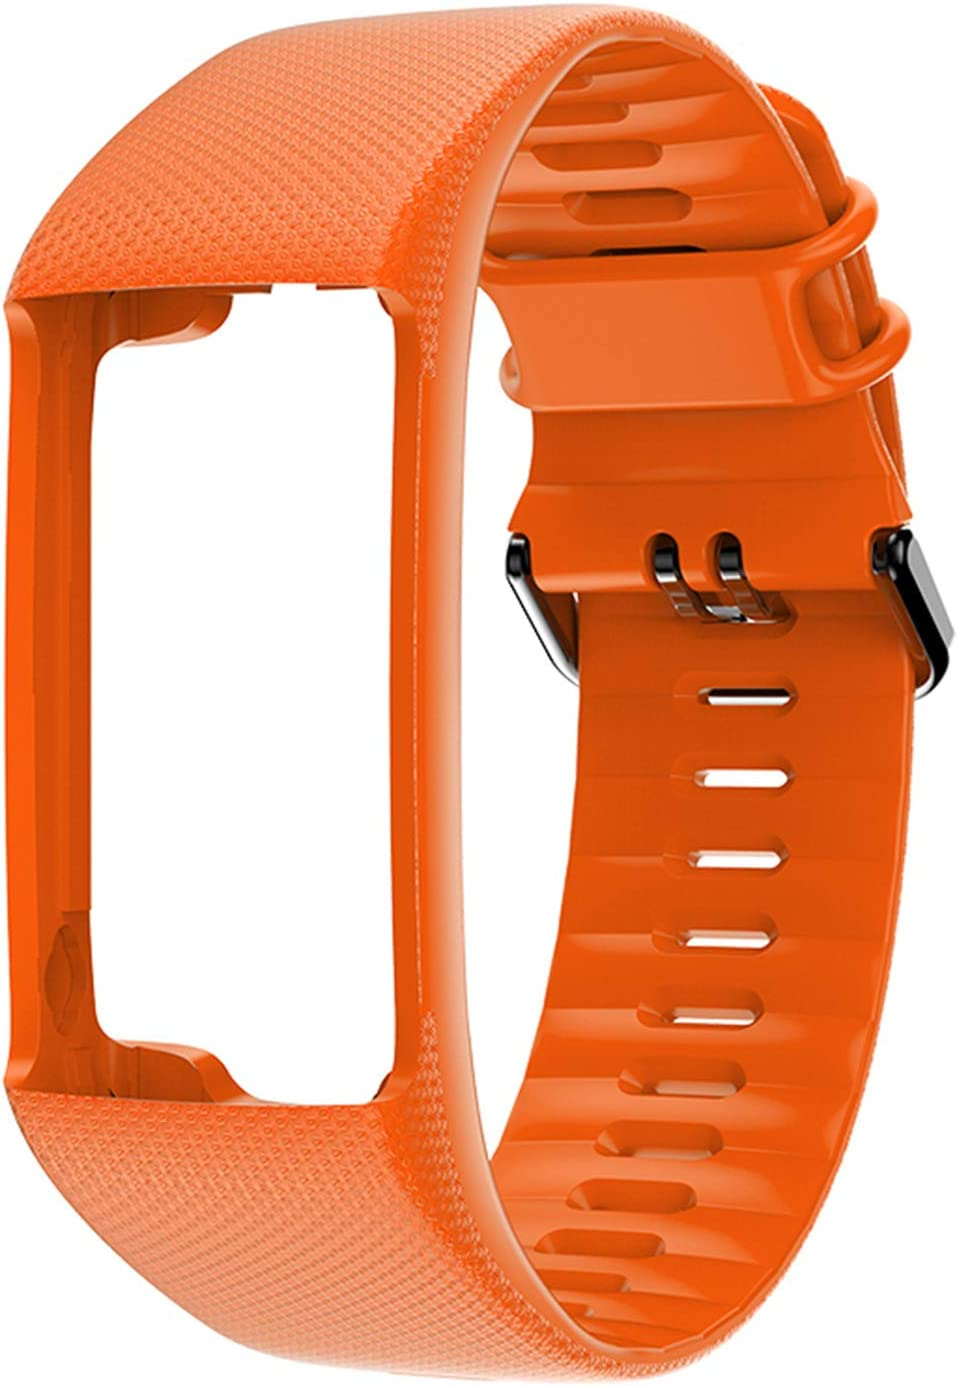 VVXXMO Correa de repuesto original de silicona, correa de reloj deportivo inteligente, adecuada para Polar A360 A370